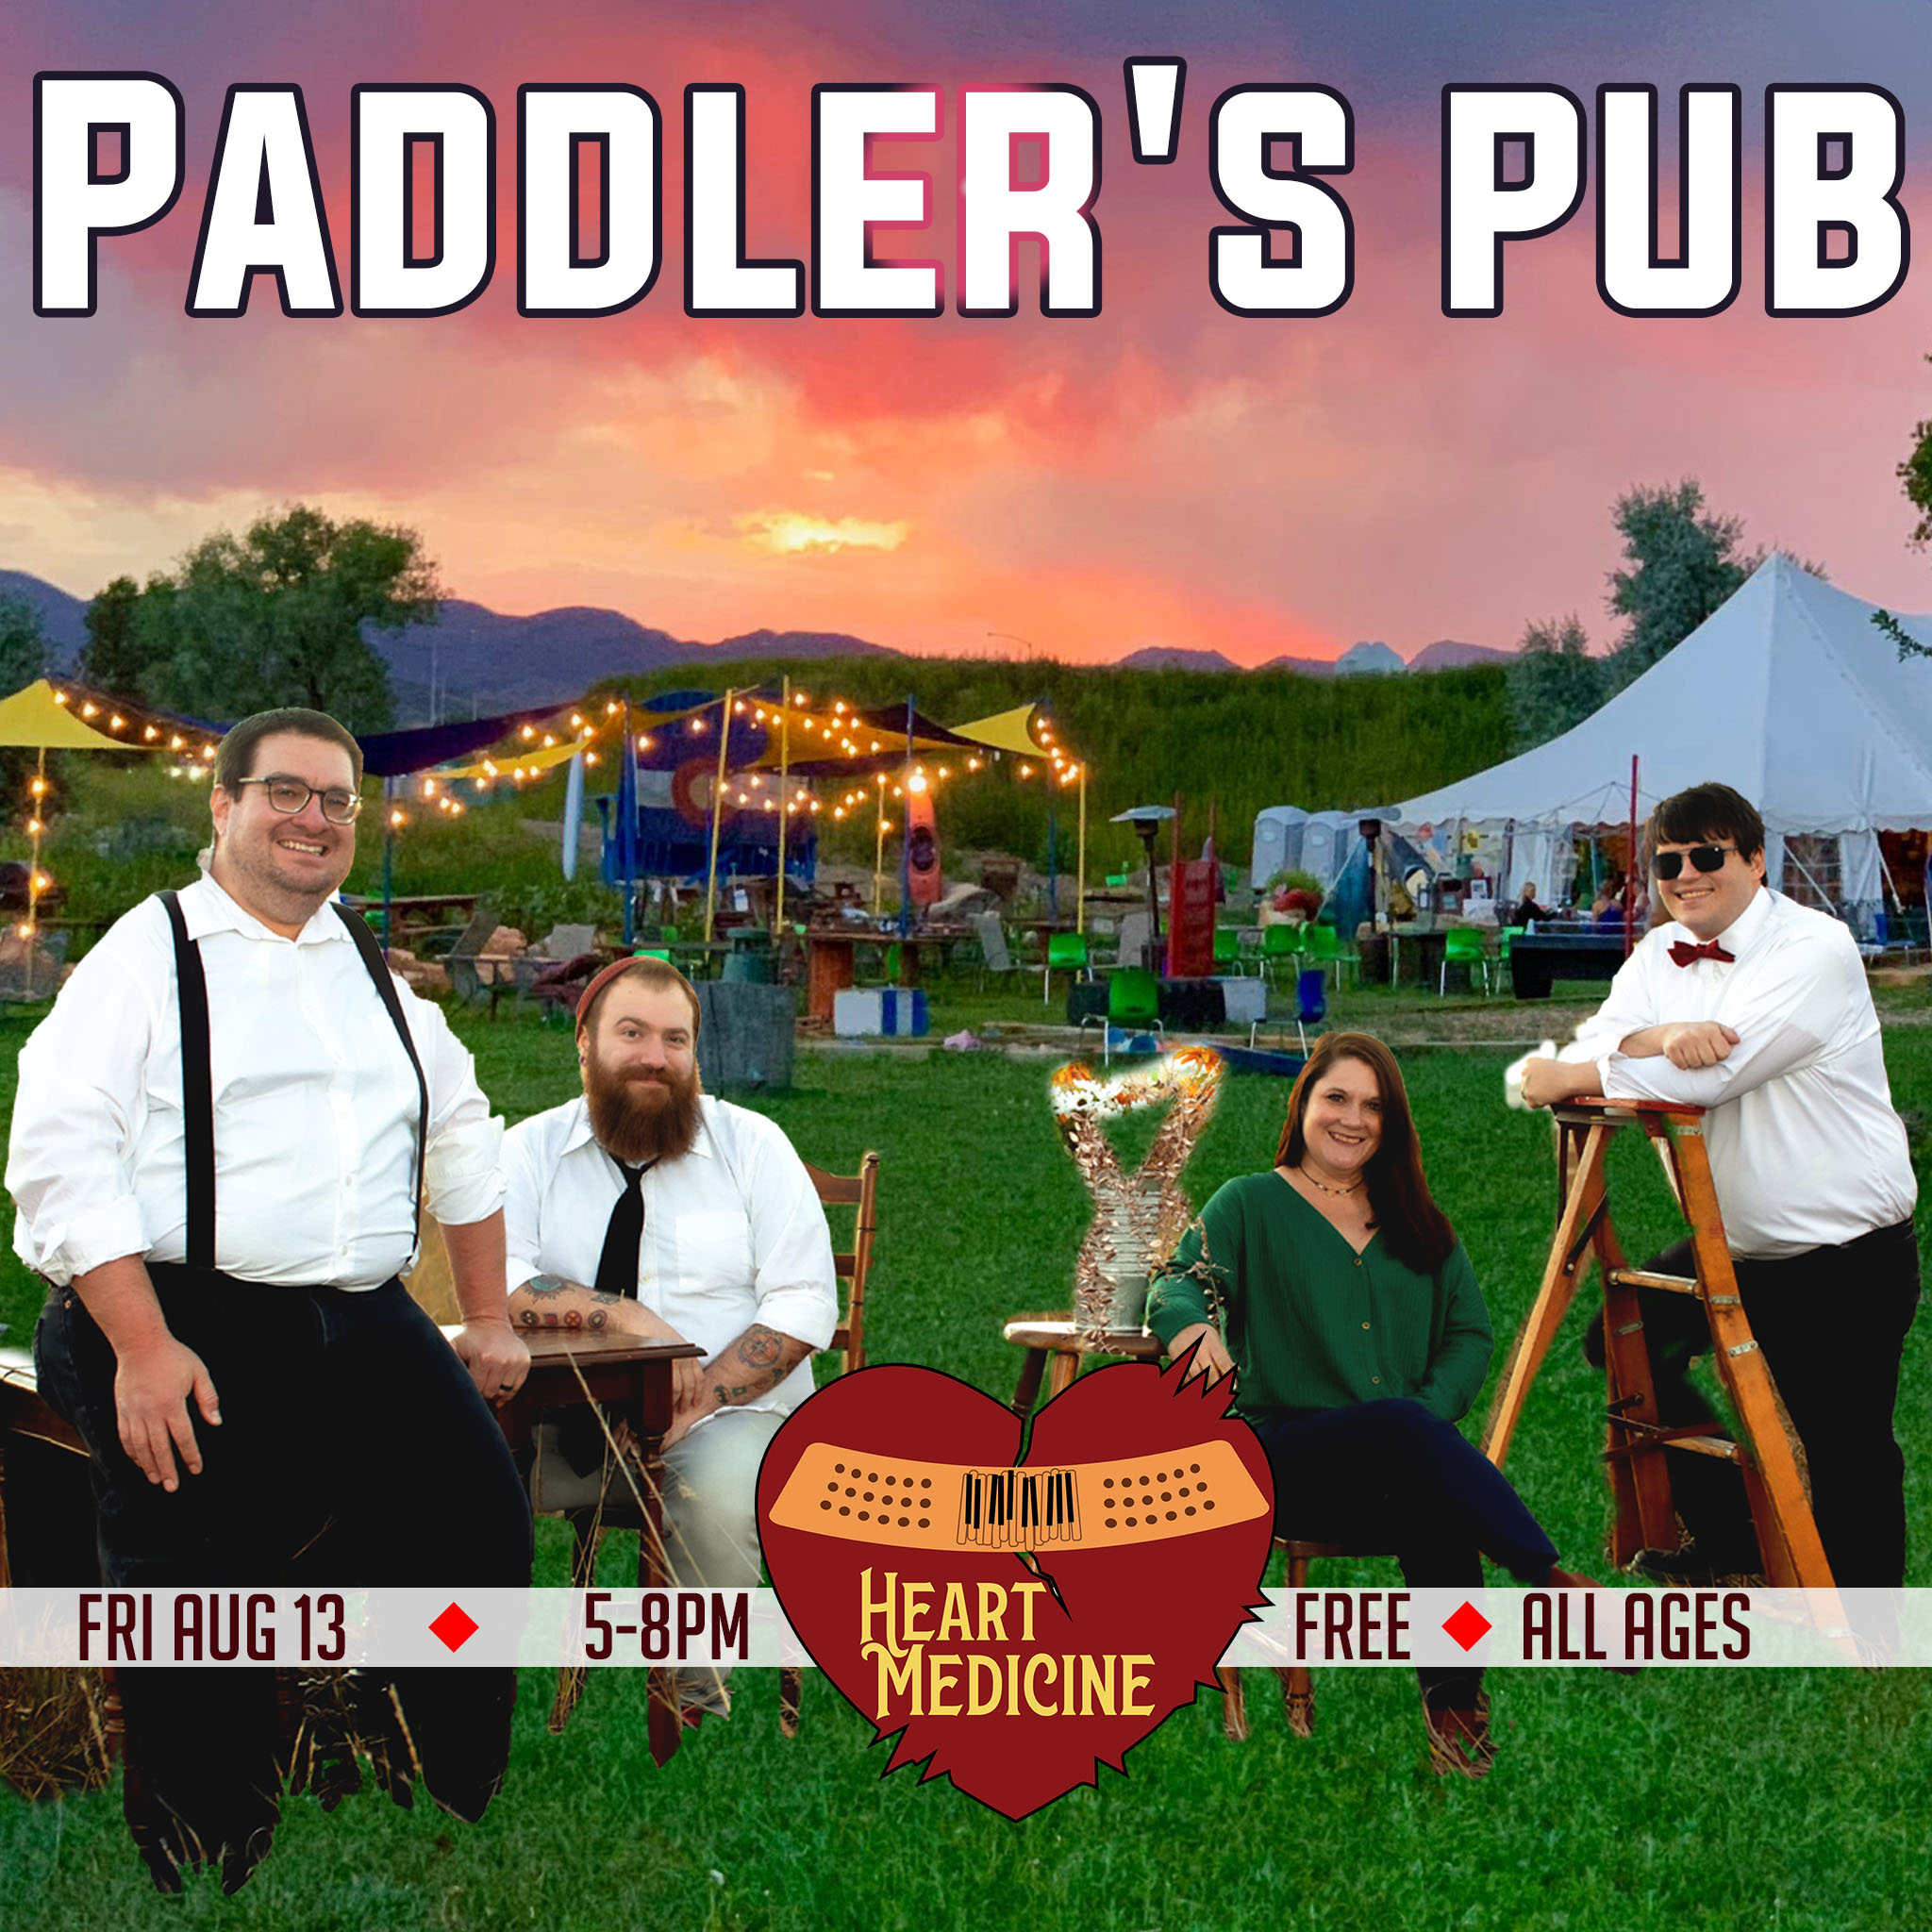 Paddler's Pub Party